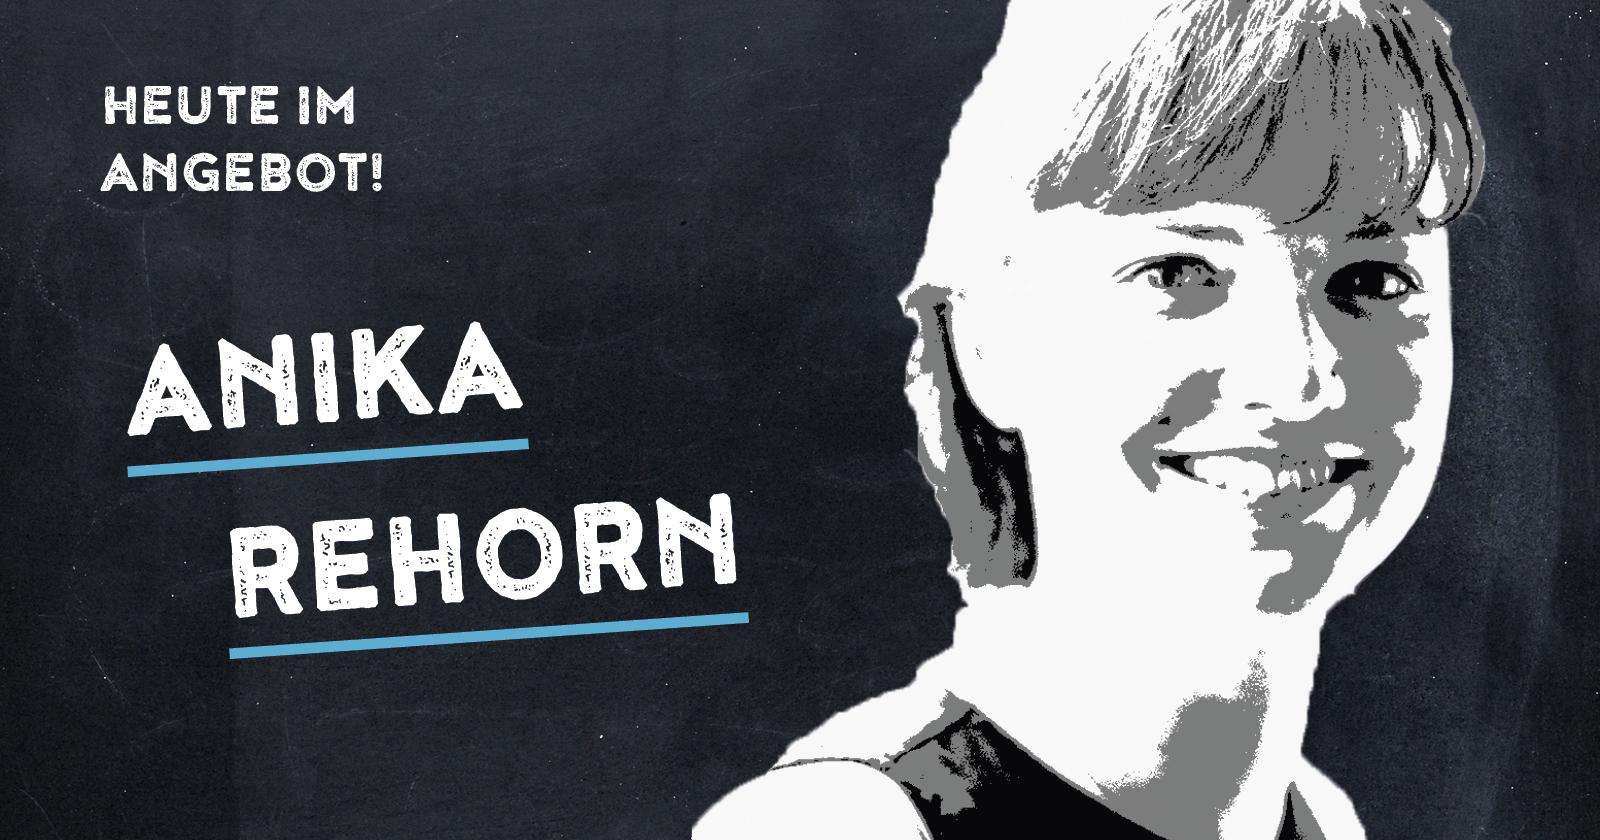 4 | Anika Rehorn